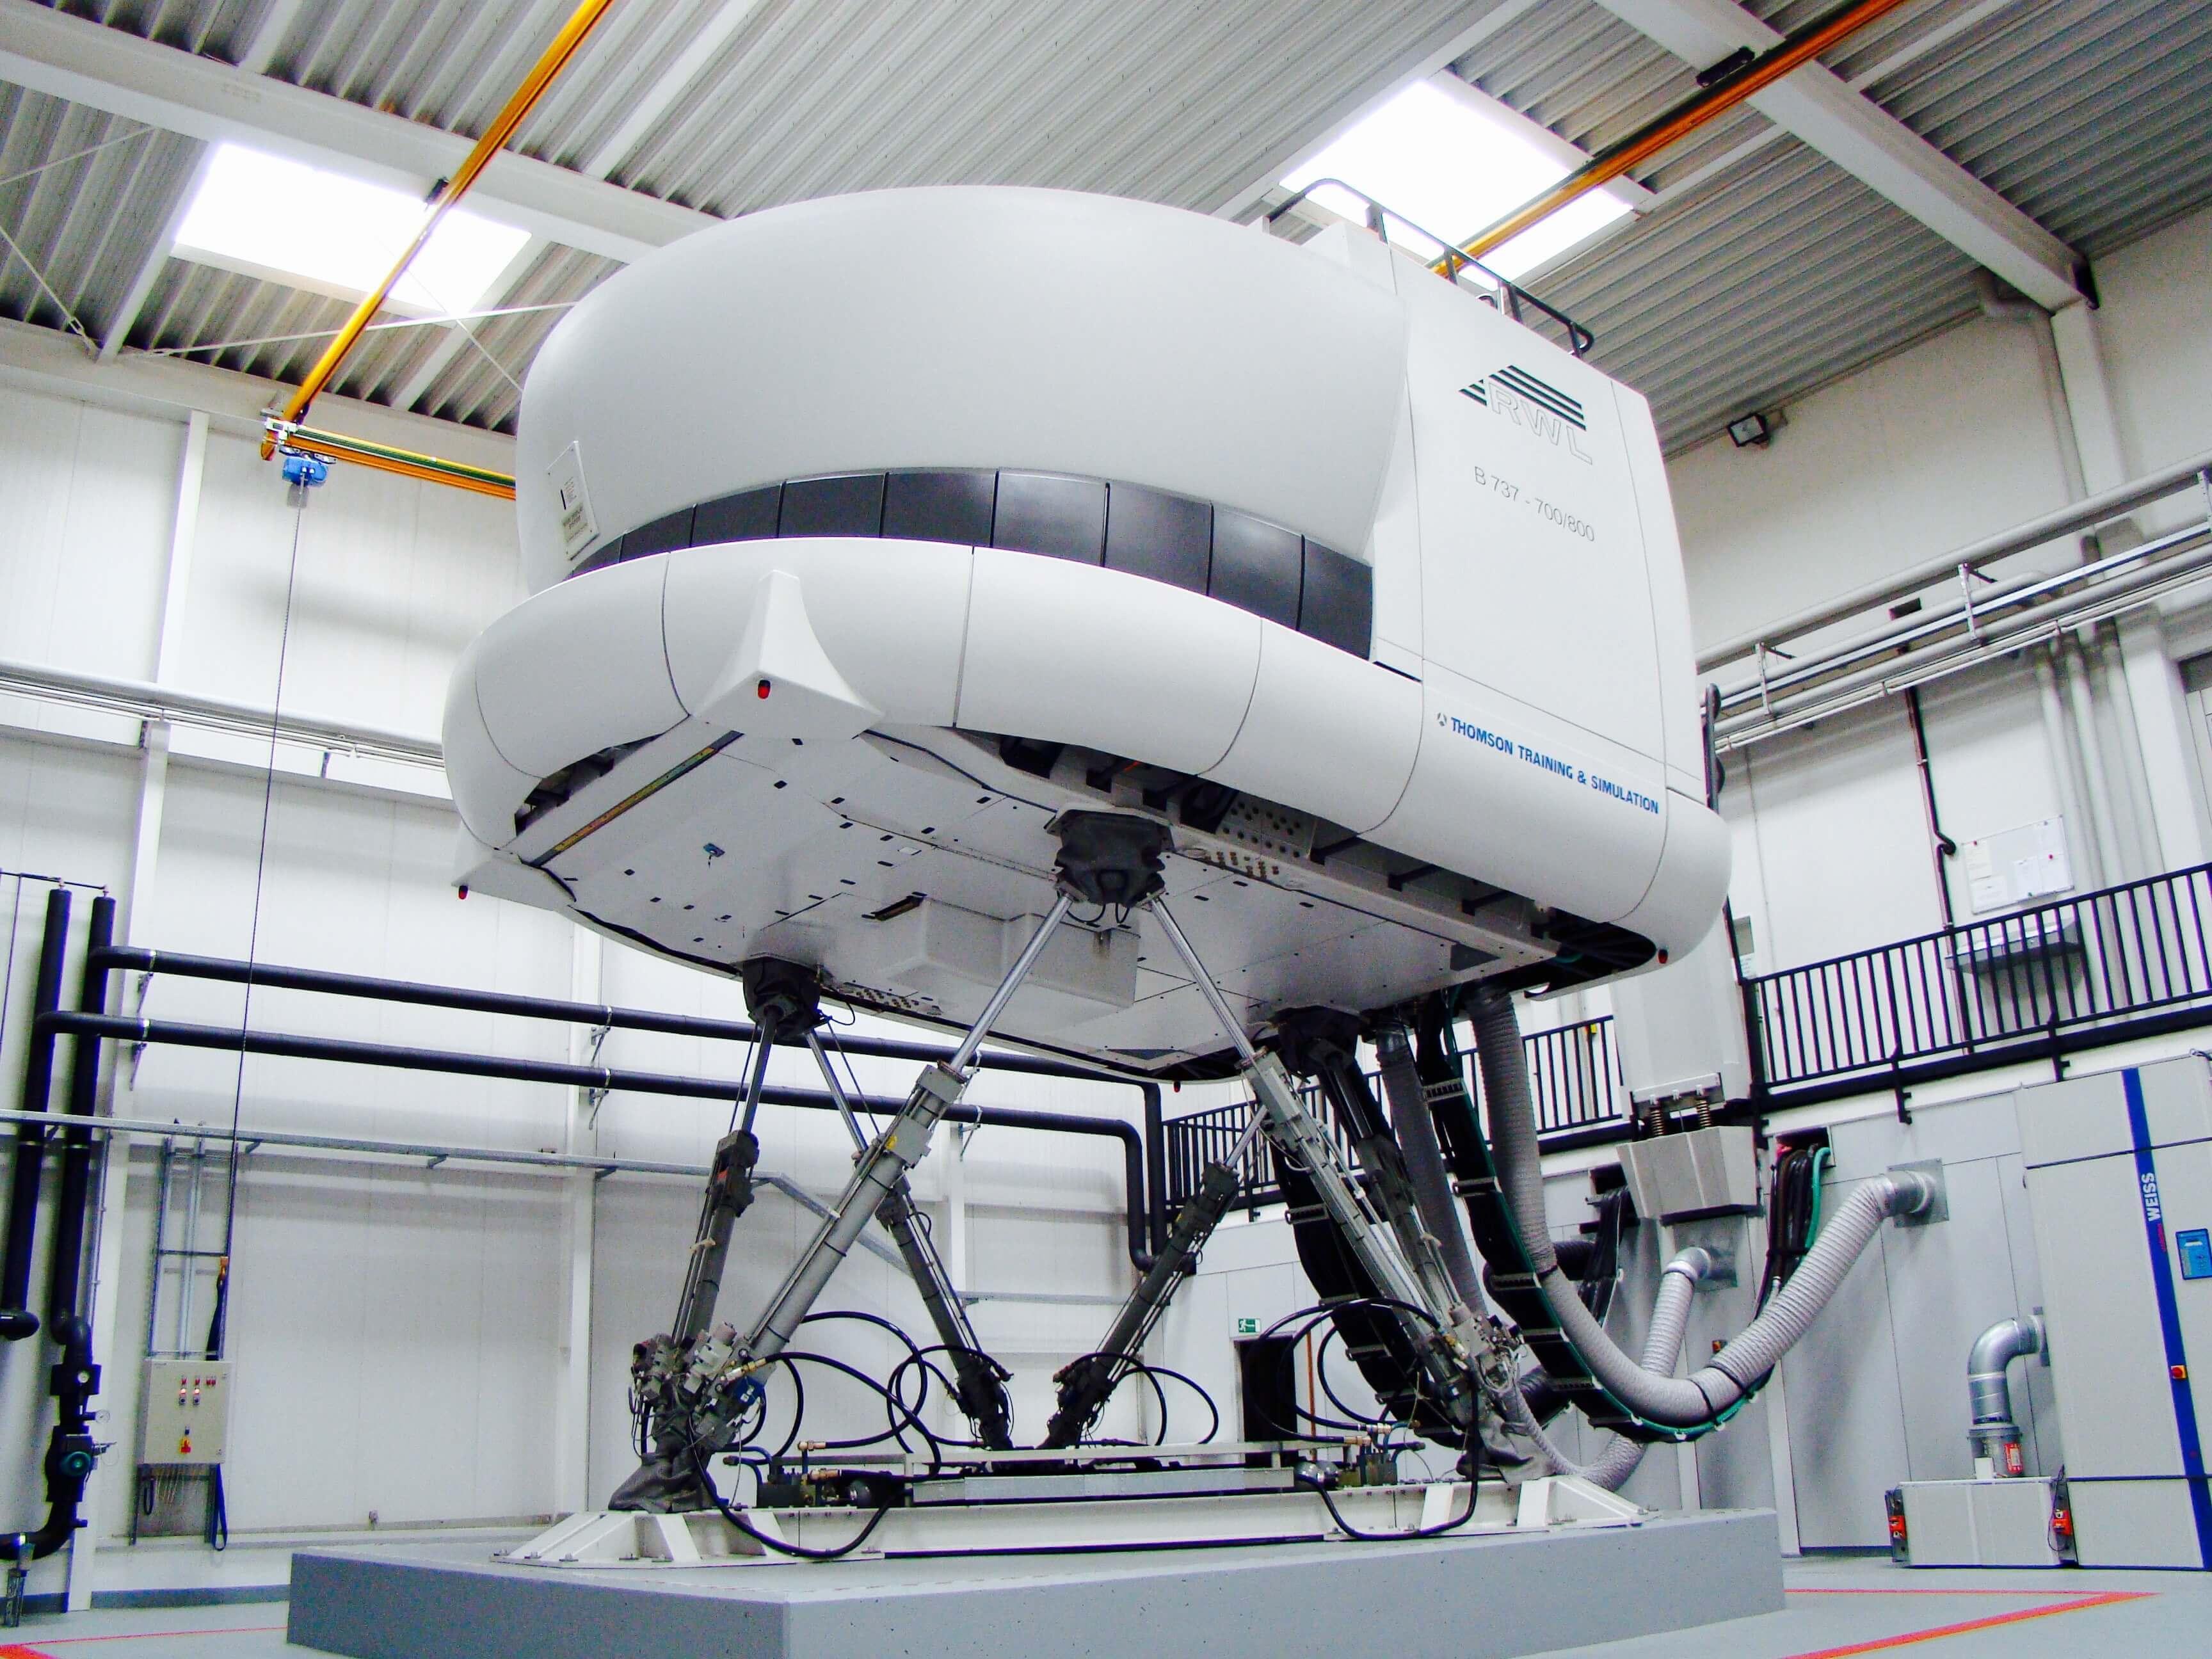 737 Simulator - Flugsimulator bei der RWL